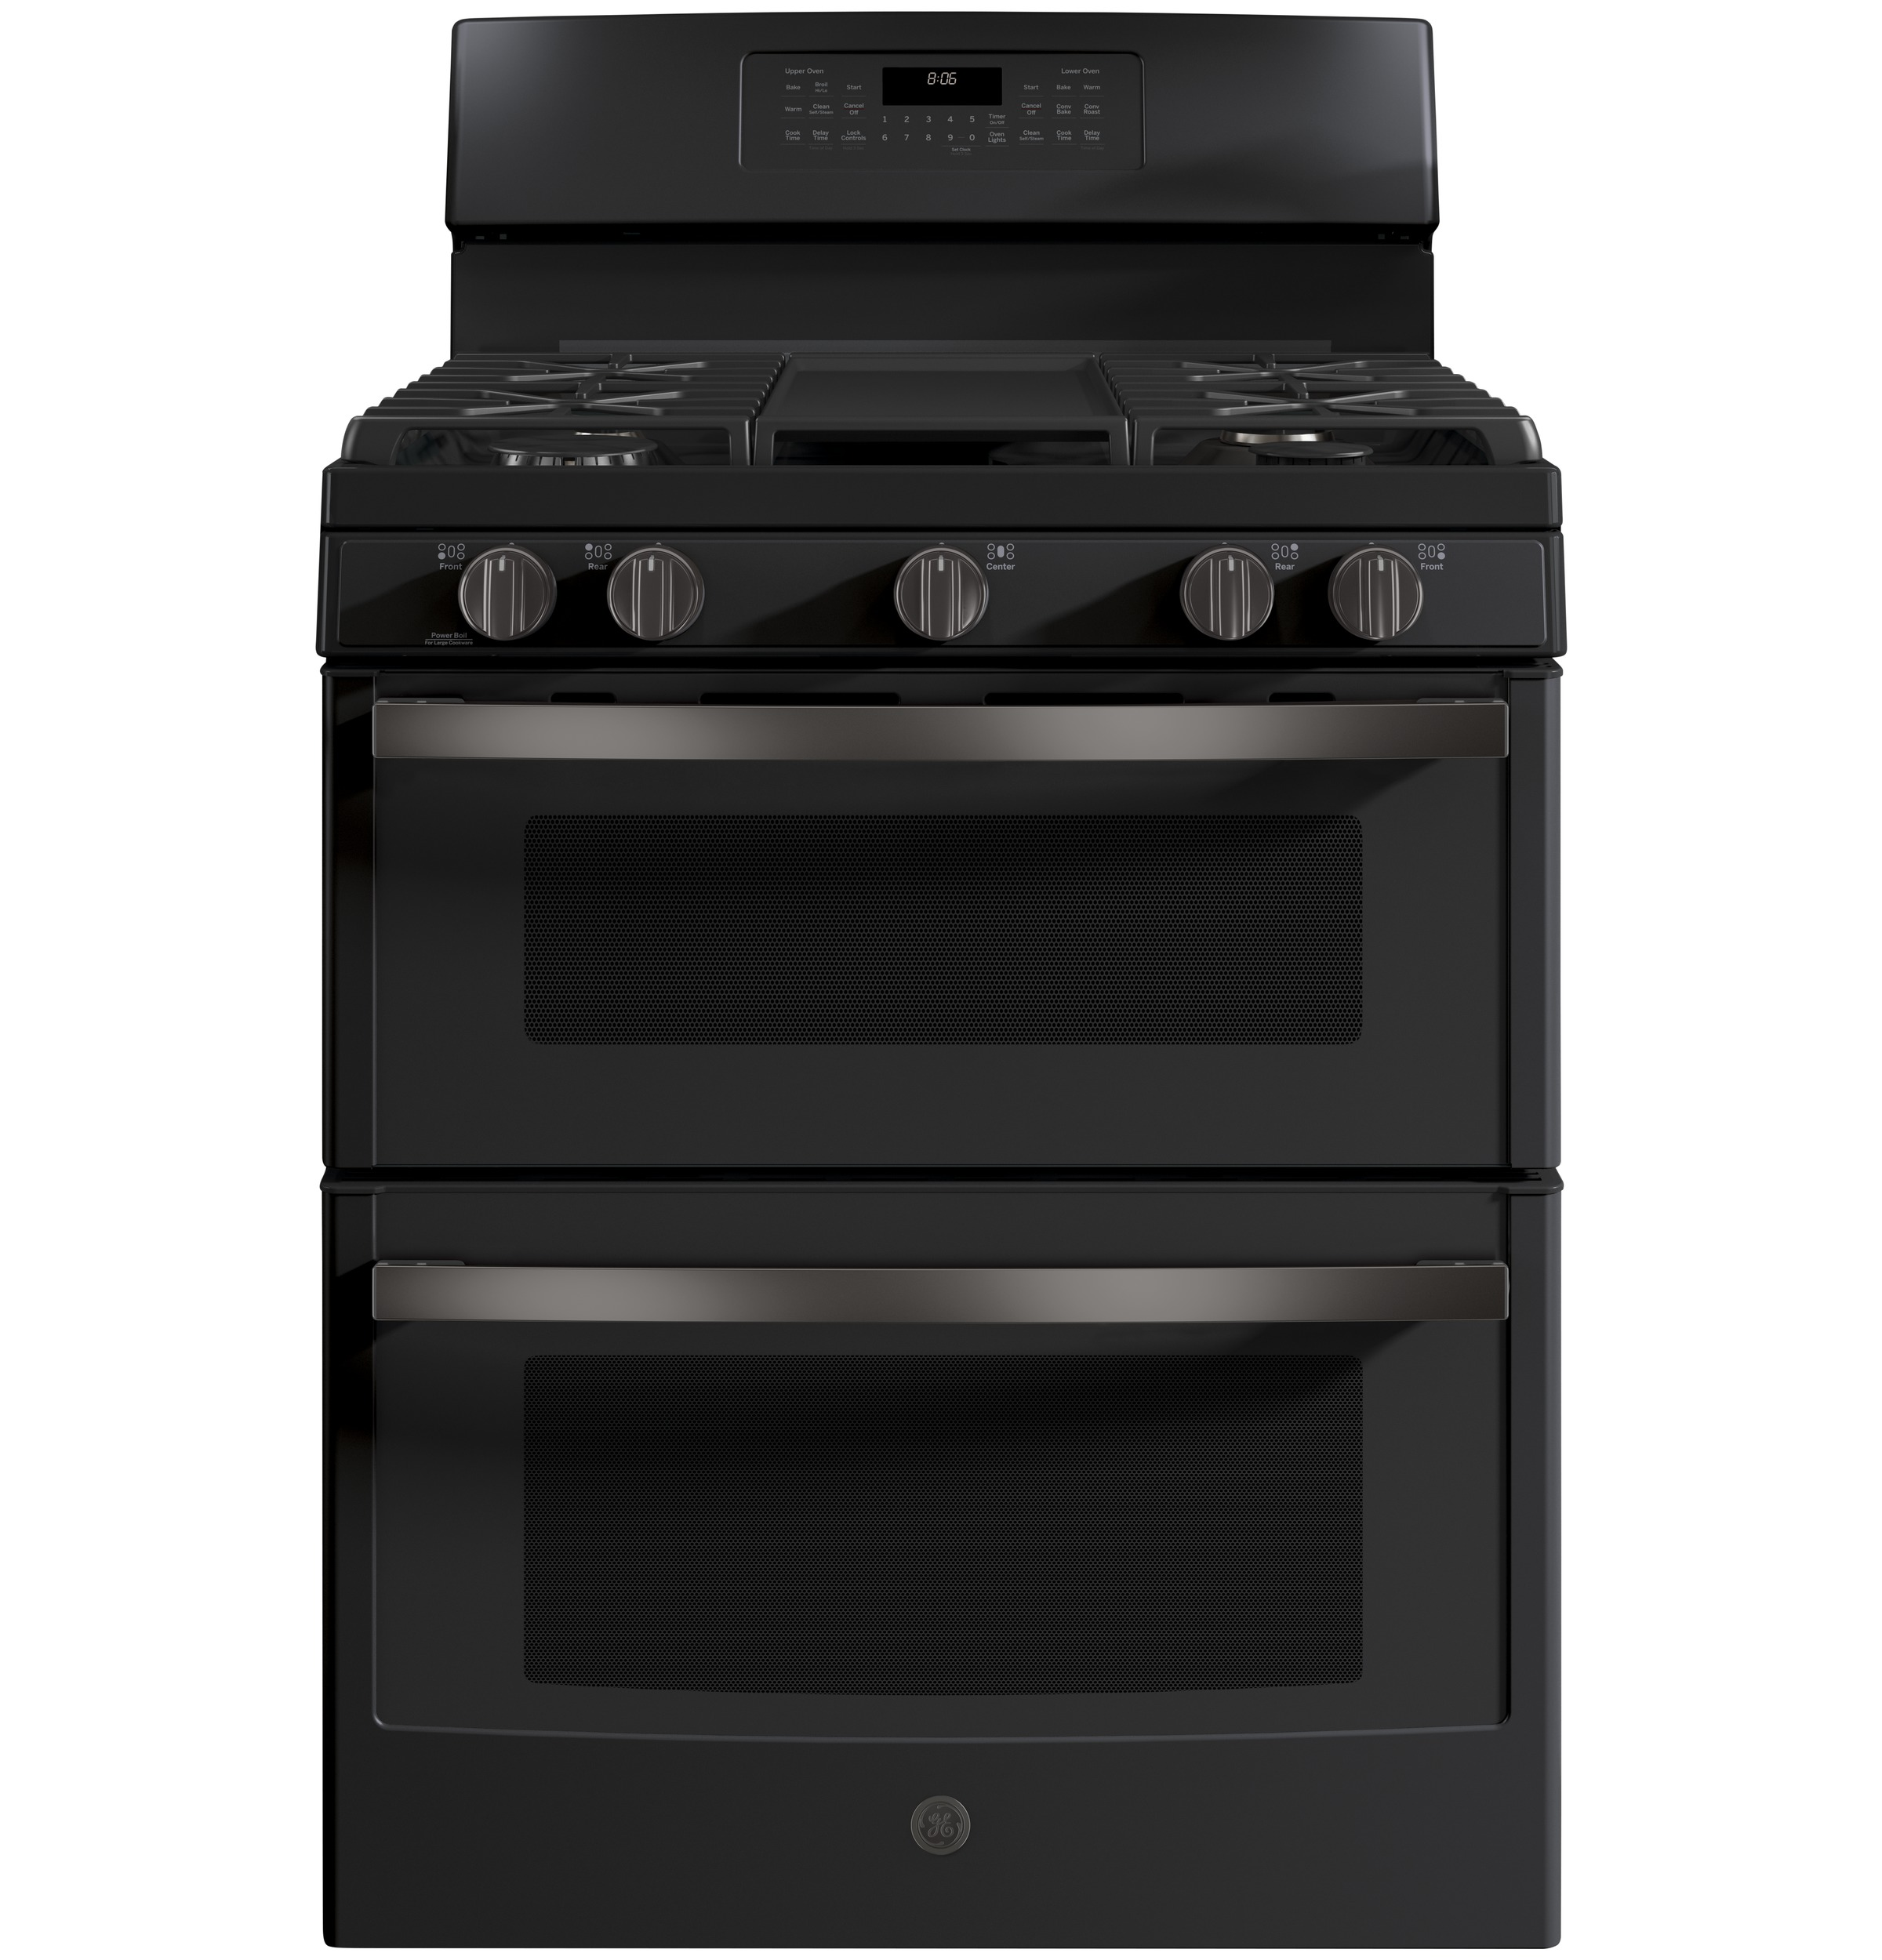 "Model: JGB860FEJDS   GE GE® 30"" Free-Standing Gas Double Oven Convection Range"